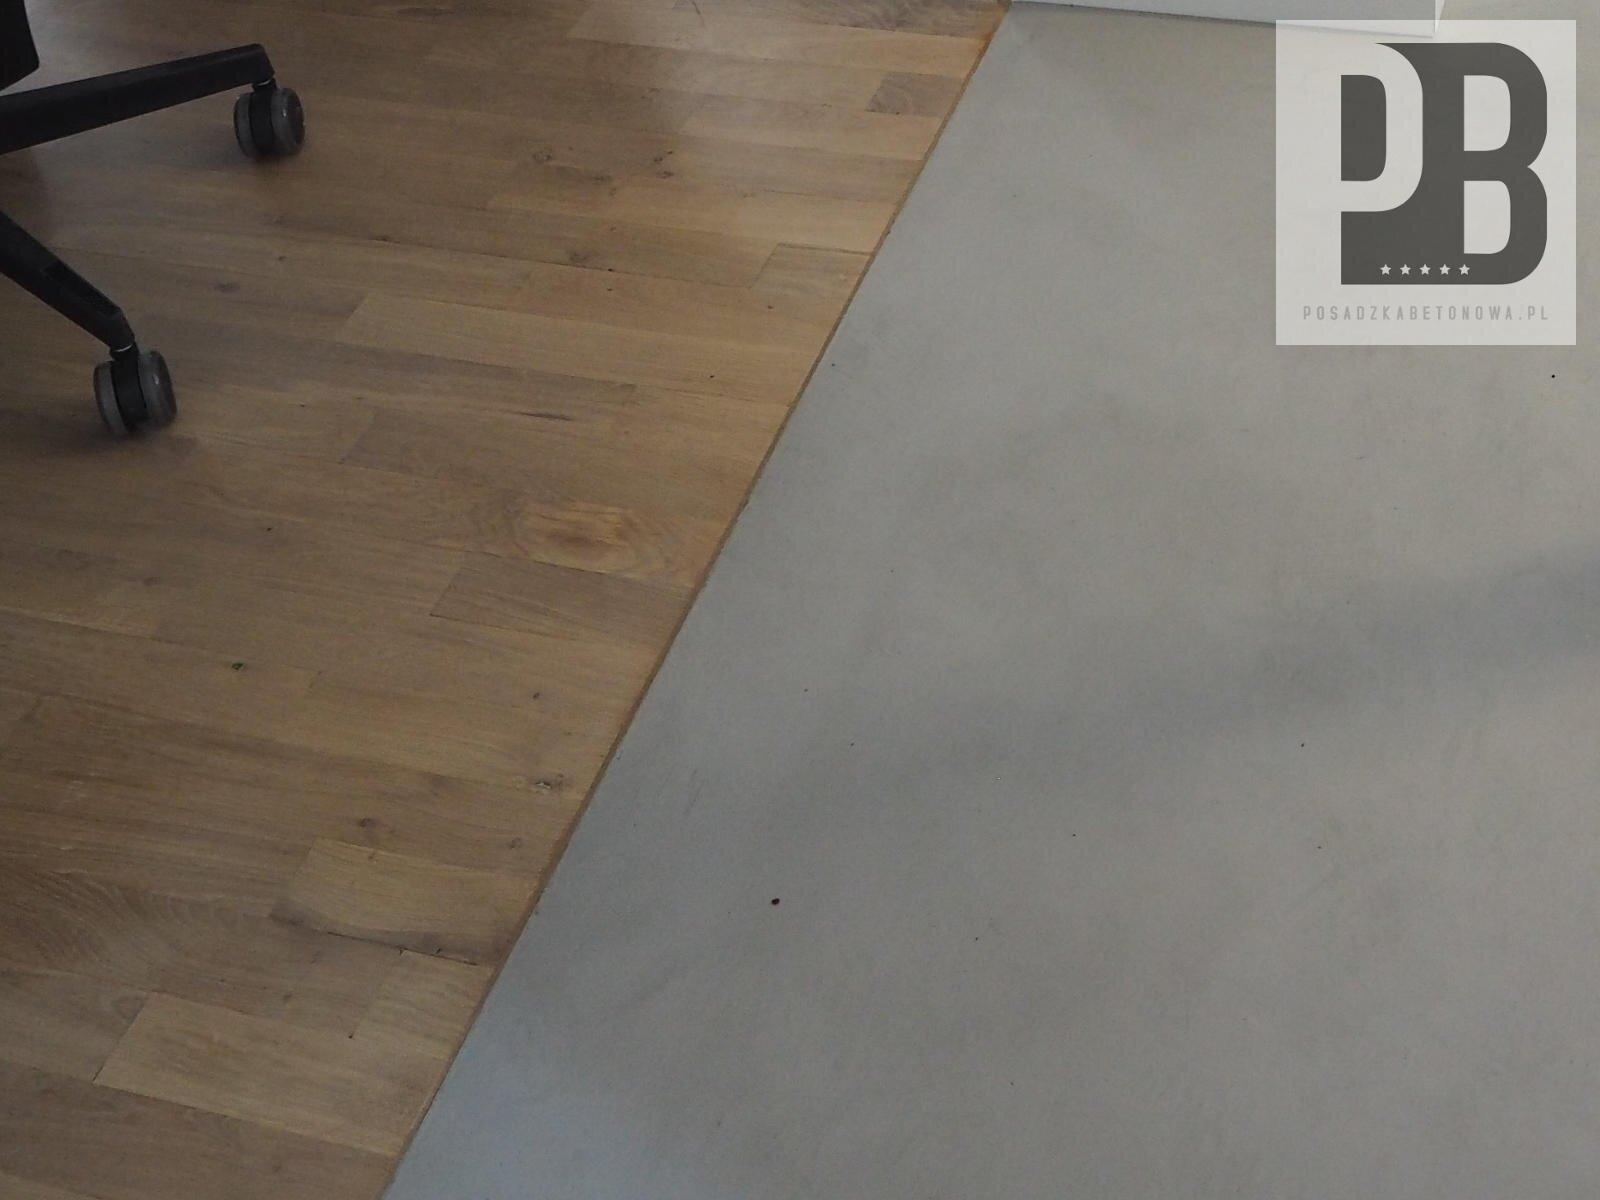 mikrocement-i-parkiet-posadka-betonowa-dekoracyjna1